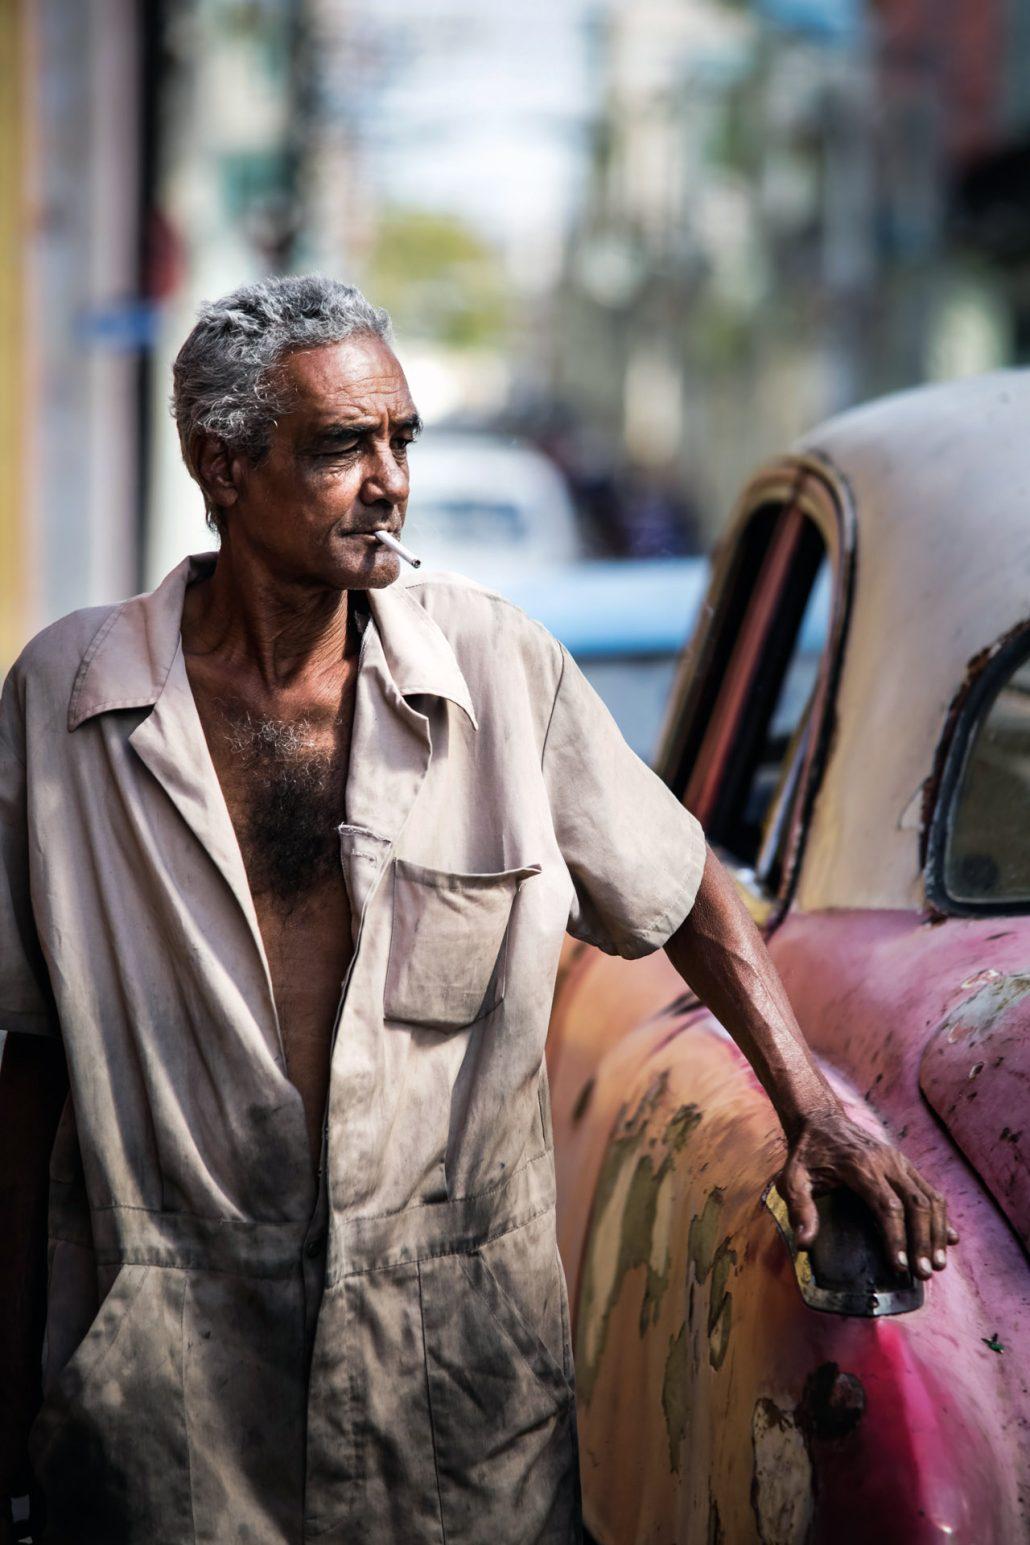 Garagiste Cubain